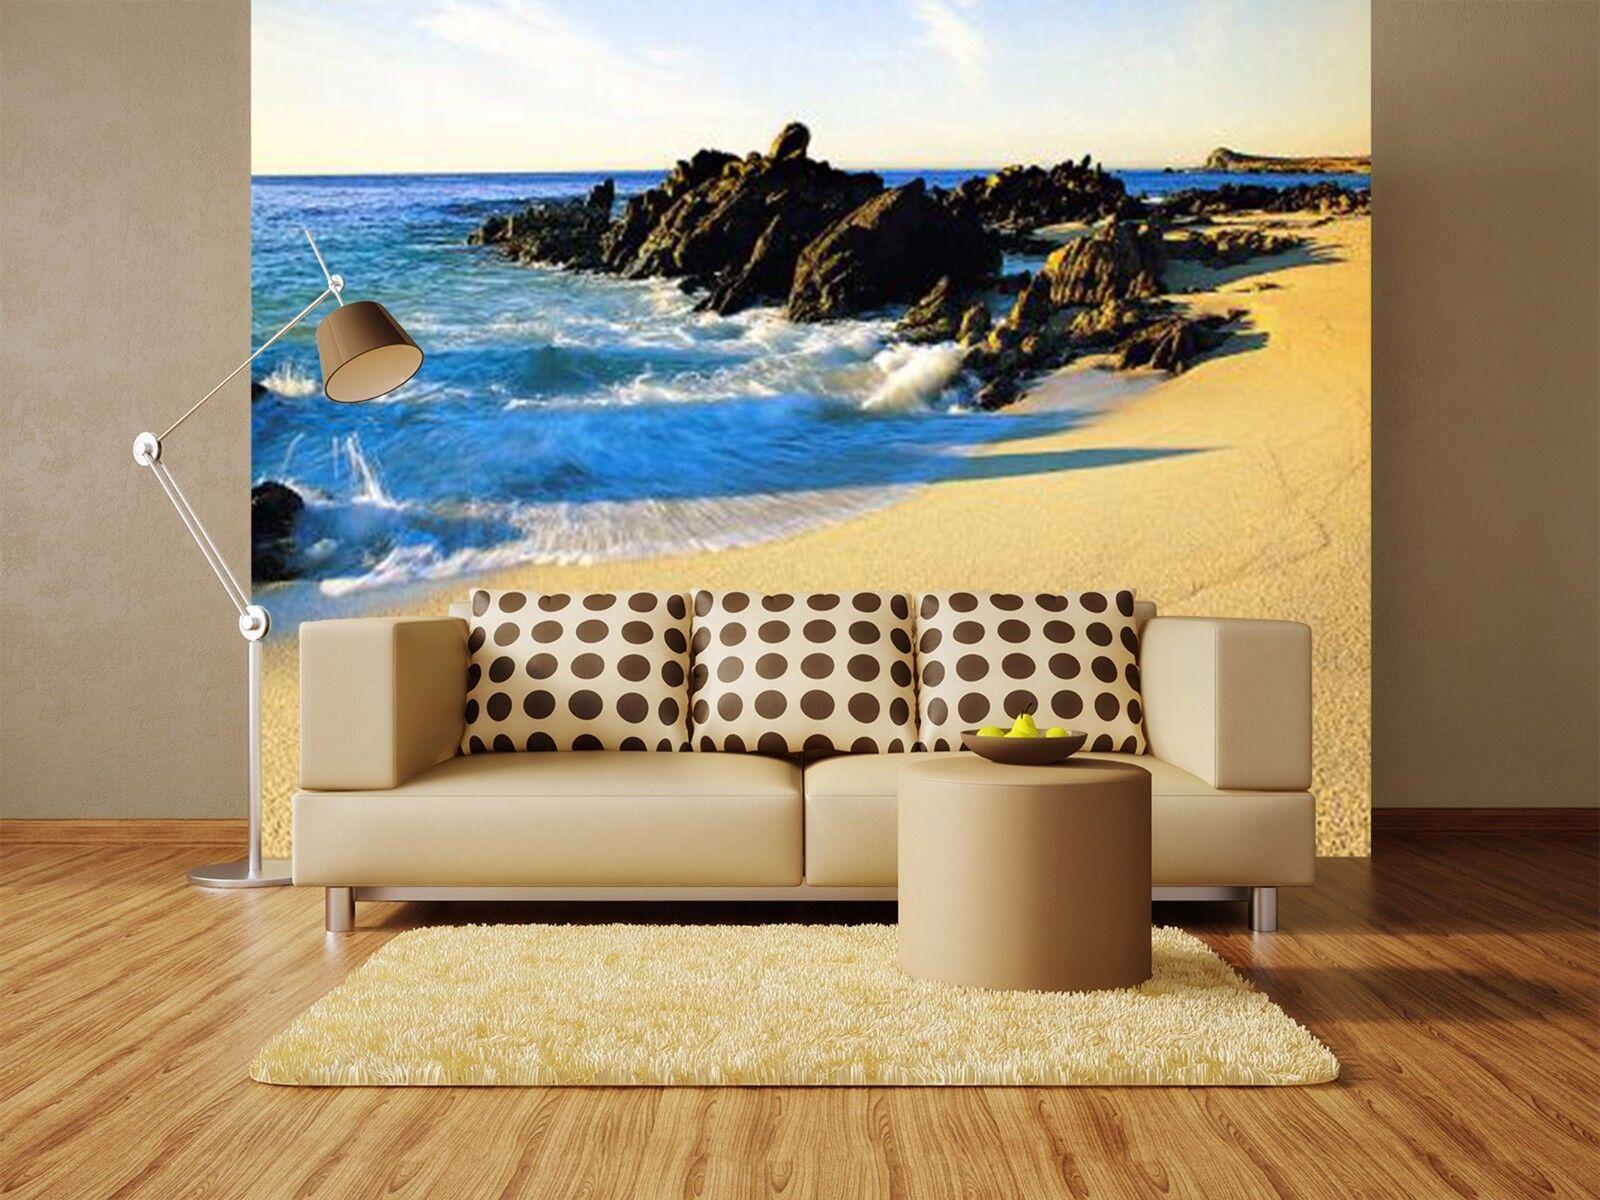 3D Blauer Himmel Himmel Himmel Strand7 Wandbild Fototapete Bild Tapete Familie Kinder DE Lemon | Auktion  | Sonderkauf  | Authentische Garantie  d07935